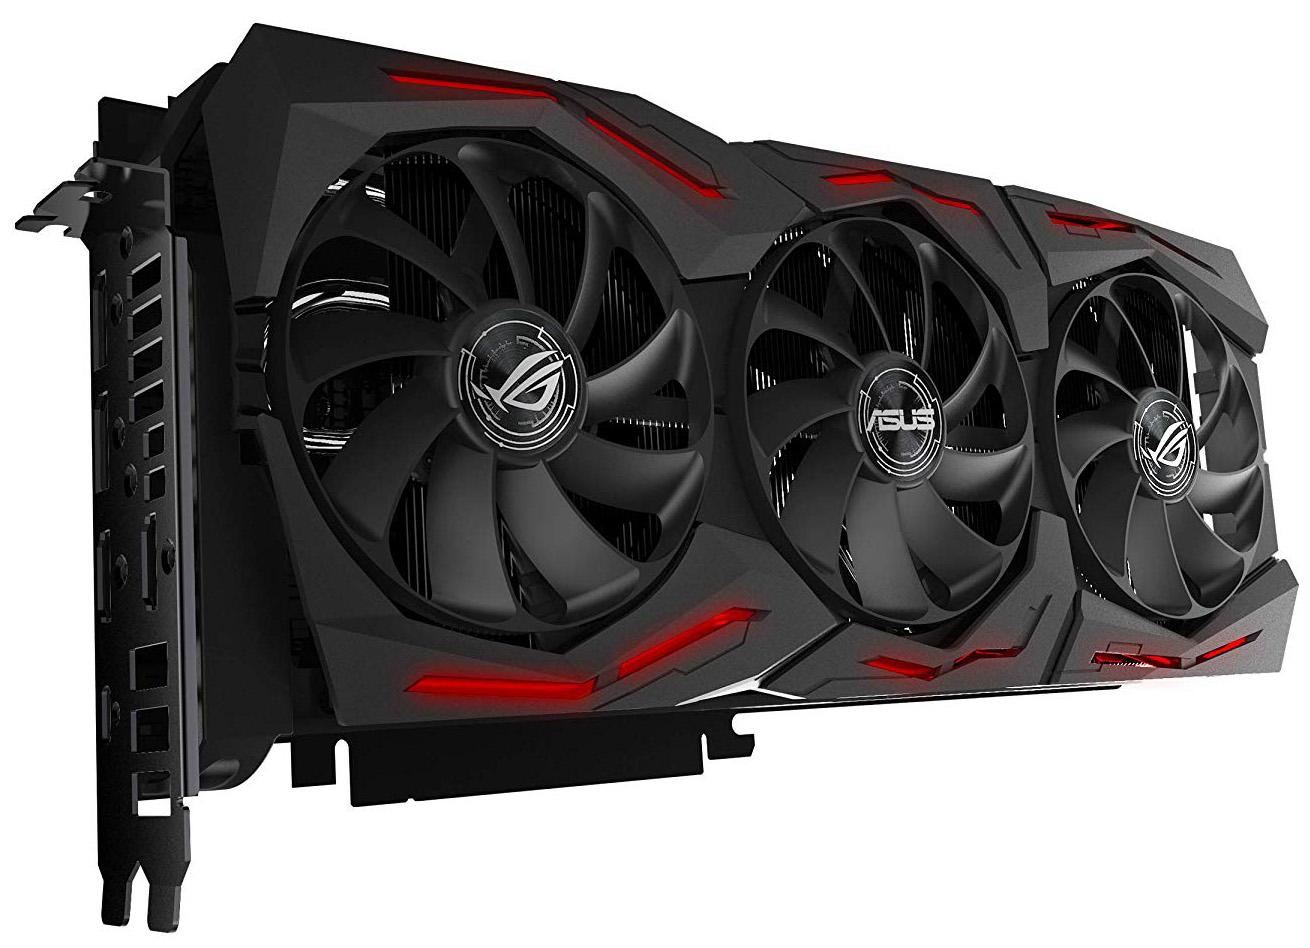 NVIDIA GeForce RTX 2070 4K & Ultrawide Gaming Performance – Techgage